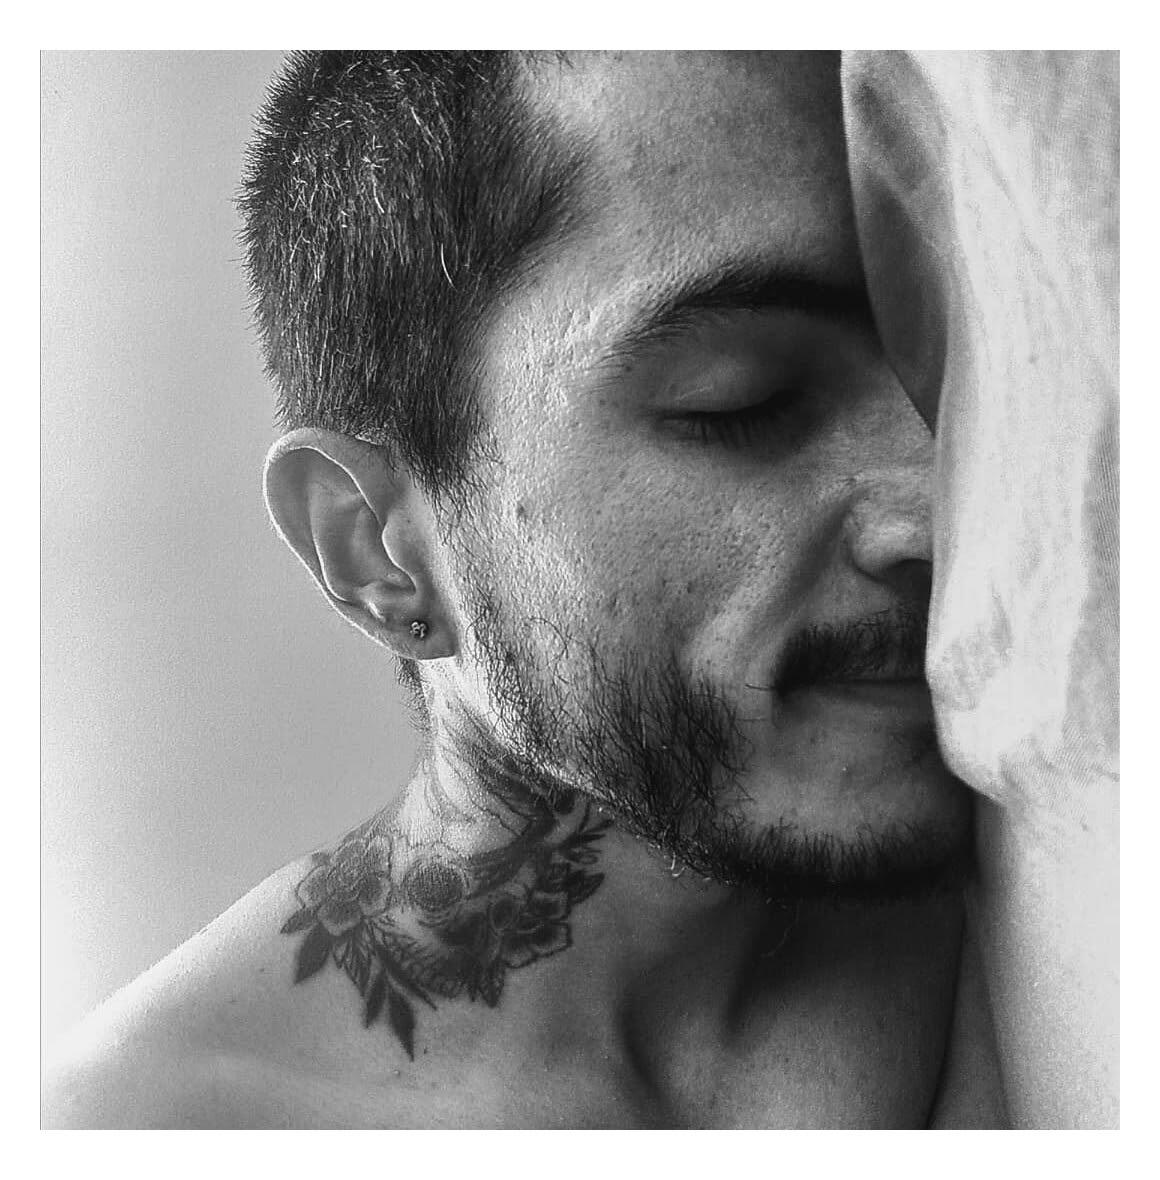 SleeP, by Luiz Gustavo Melo.